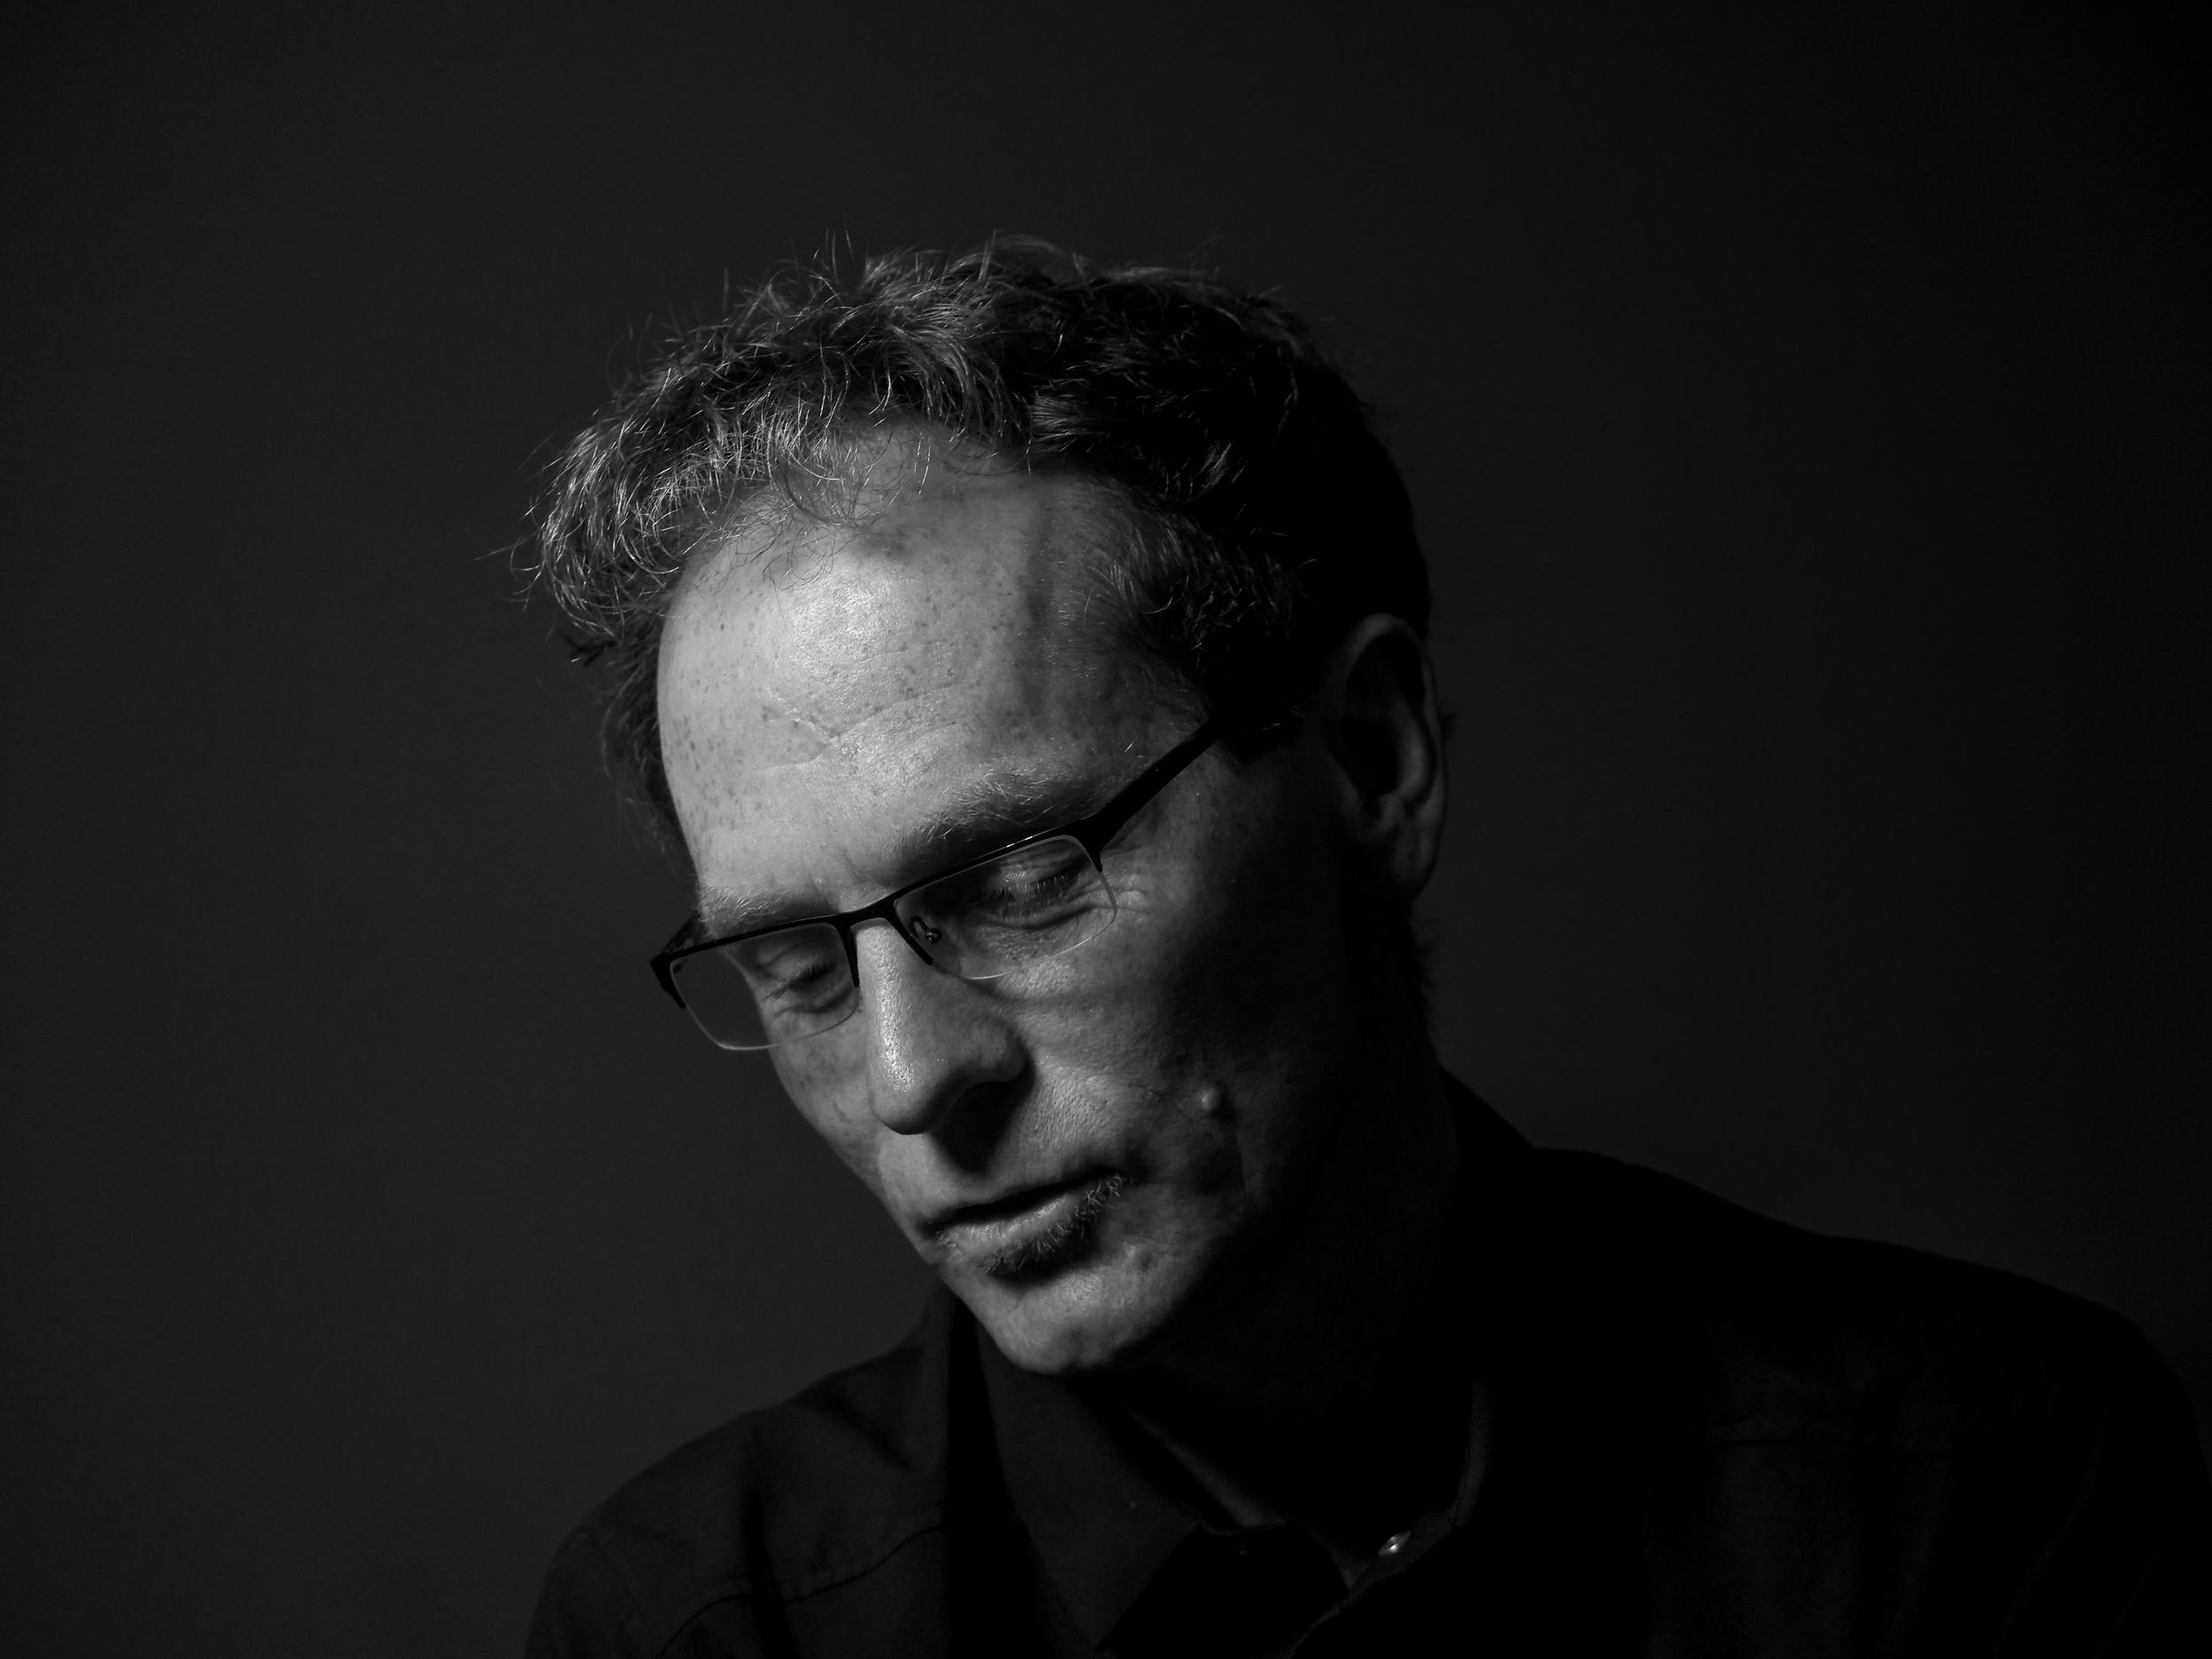 Filmmaker Skye Fitzgerald. Courtesy of Spin Films/Ryot/The New Yorker